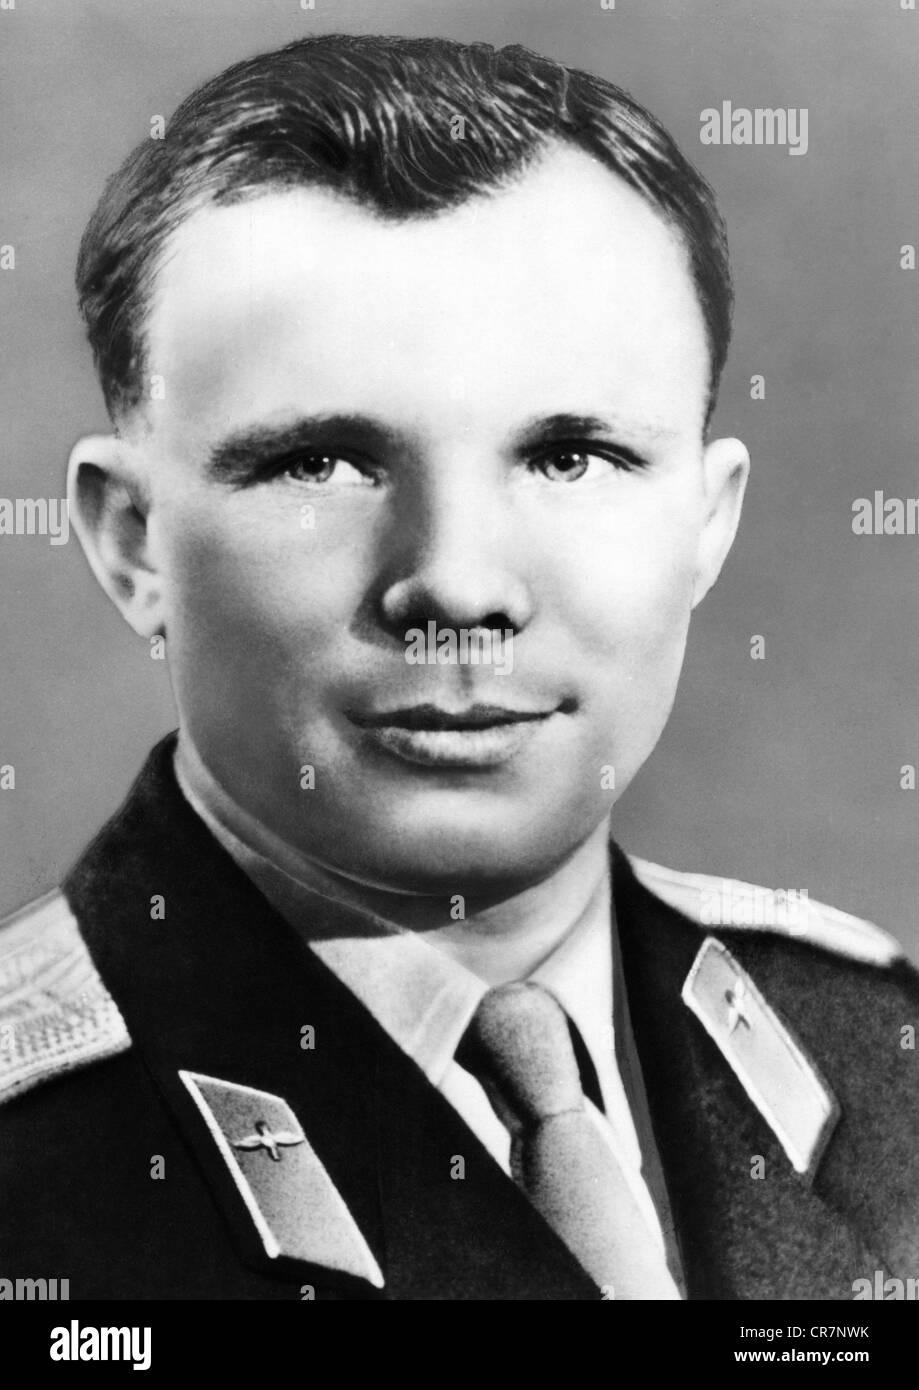 Gagarin, Yuri, 9.3.1934 - 27.3.1968, Soviet spaceman (cosmonaut), portrait, postcard, East-Germany, circa 1971, - Stock Image